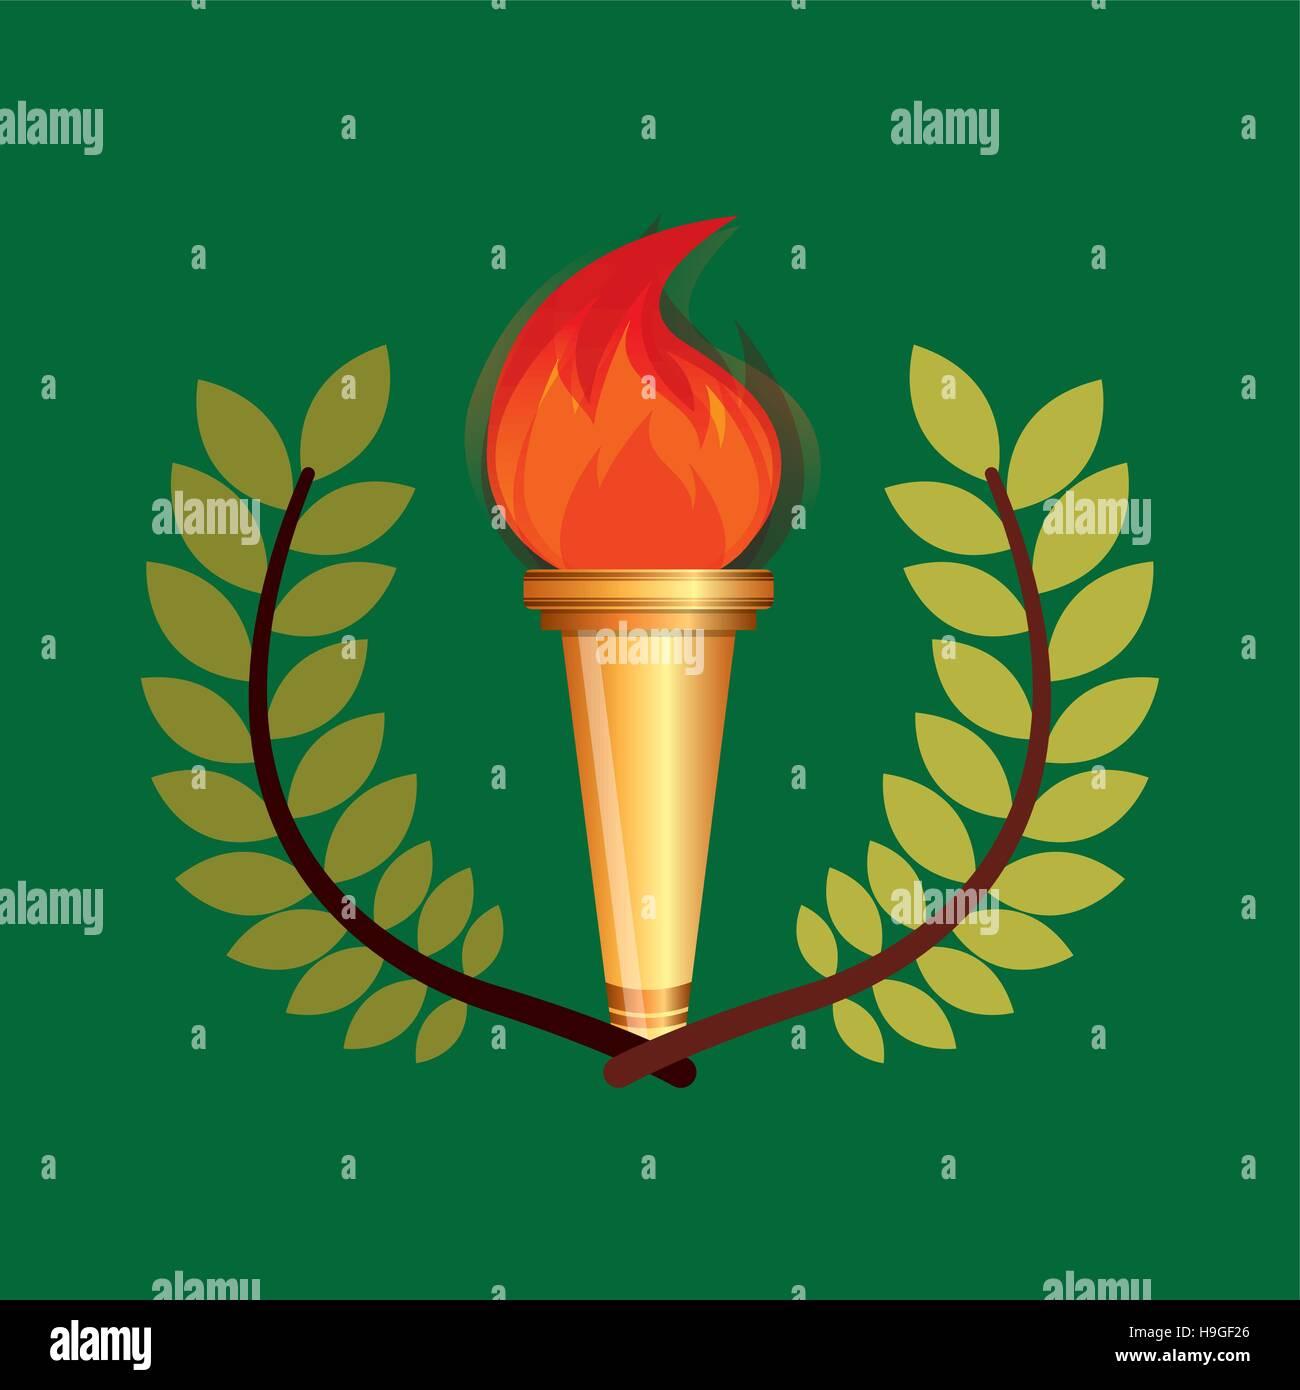 burning torch olympic games emblem vector illustration eps 10 - Stock Vector